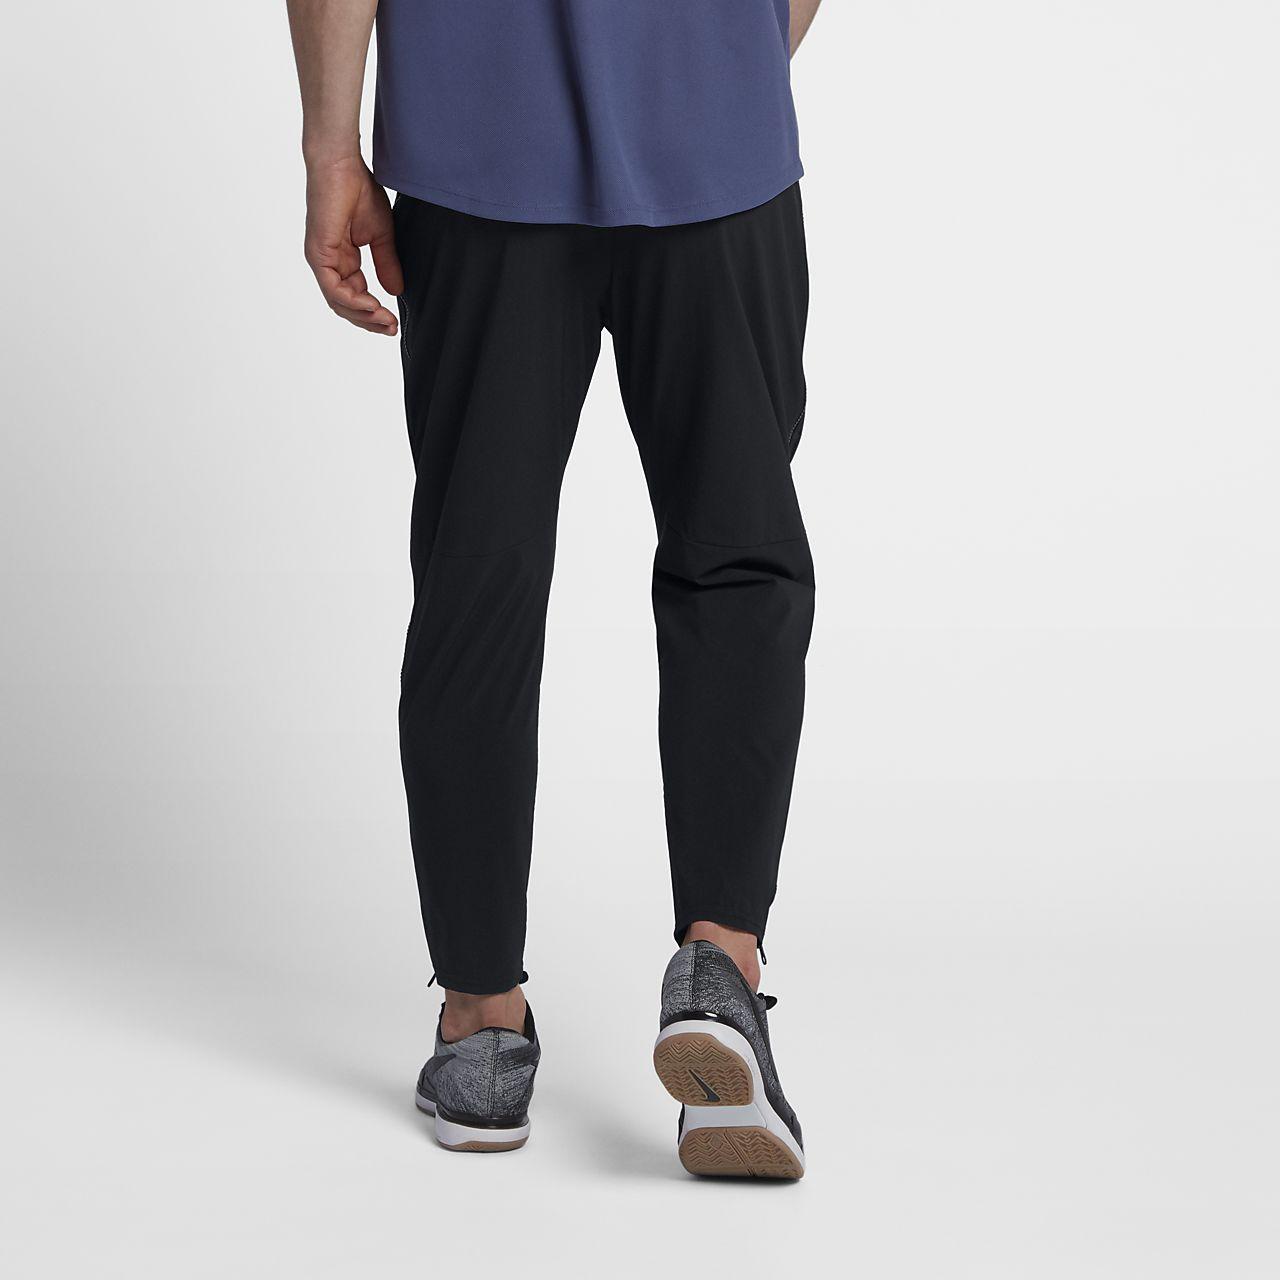 887524-010 - Pantalon de tennis - Homme - Noir - LNike KhKm6nKOx